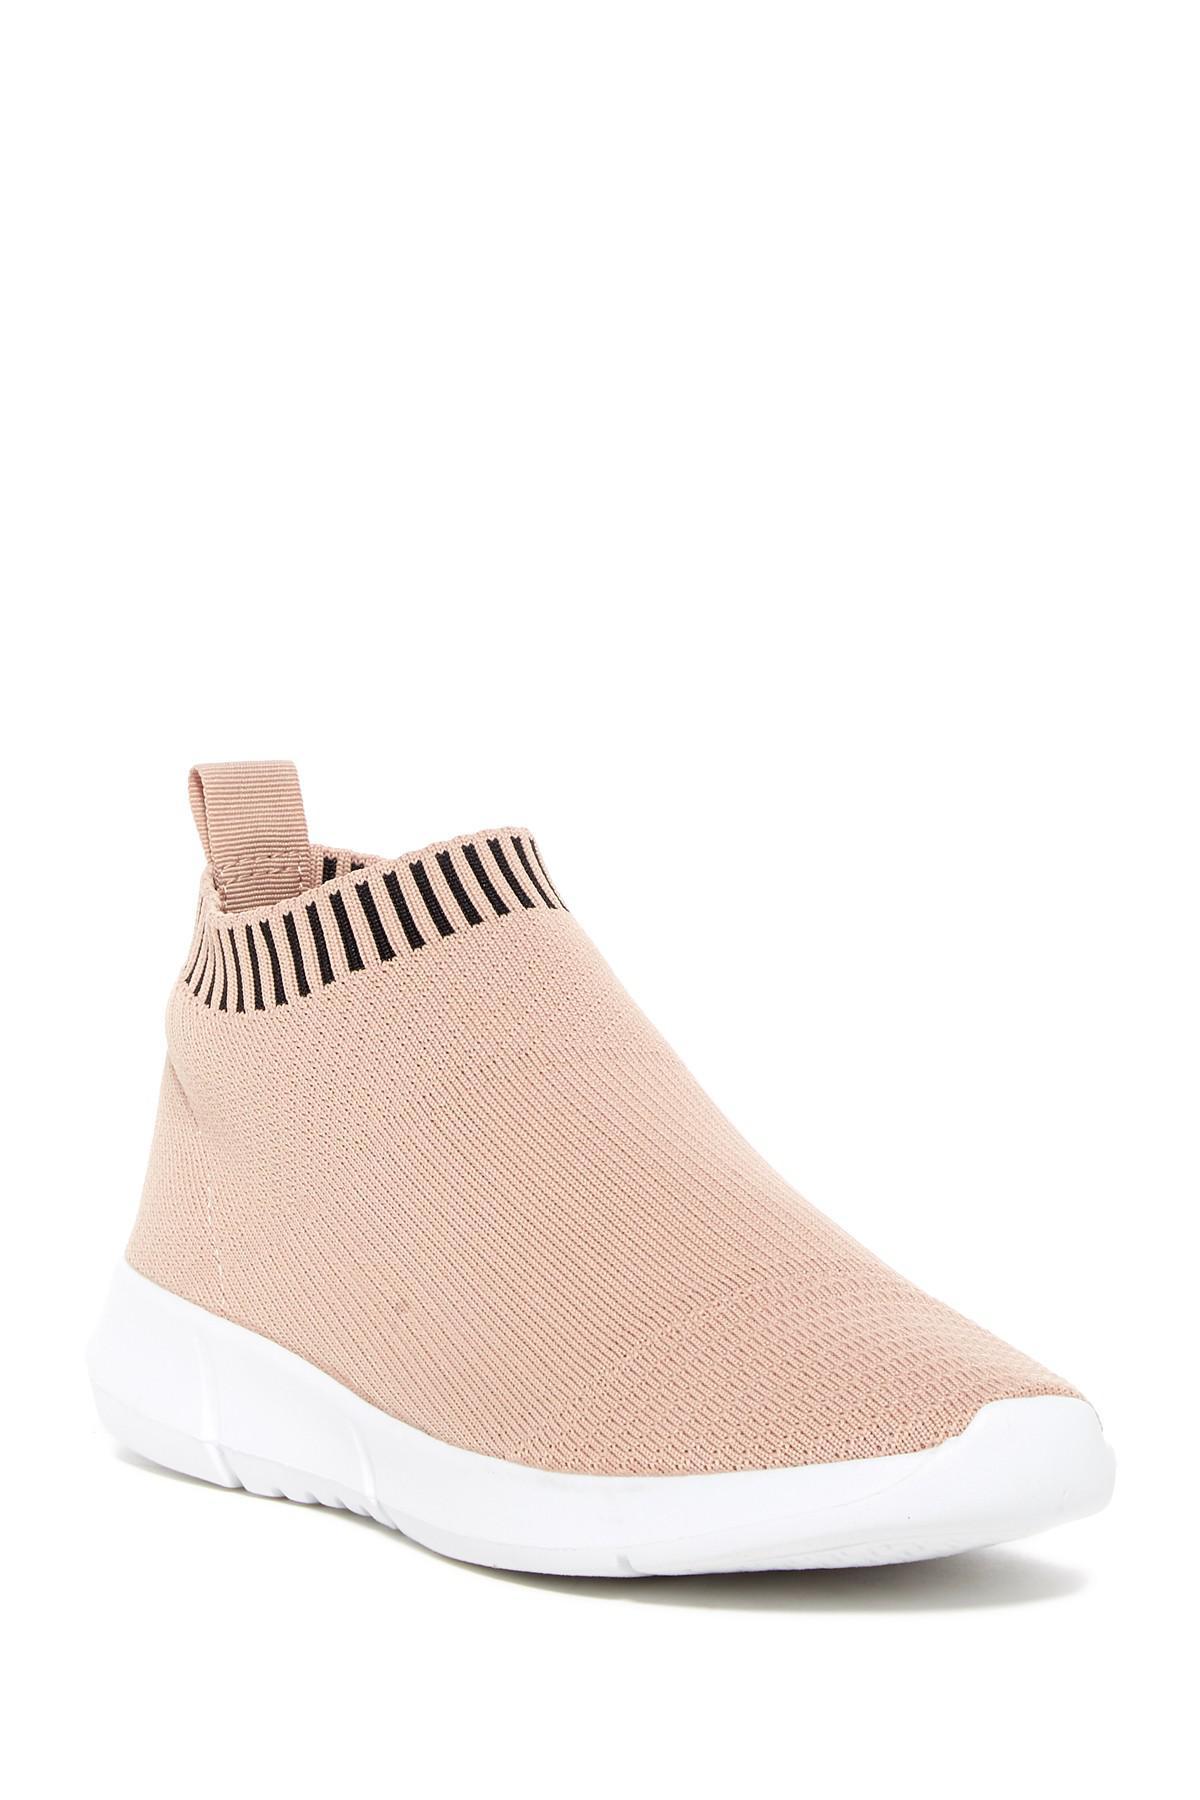 2f822688c56 Lyst - Steve Madden Farson Stretch Knit Sneaker in Pink